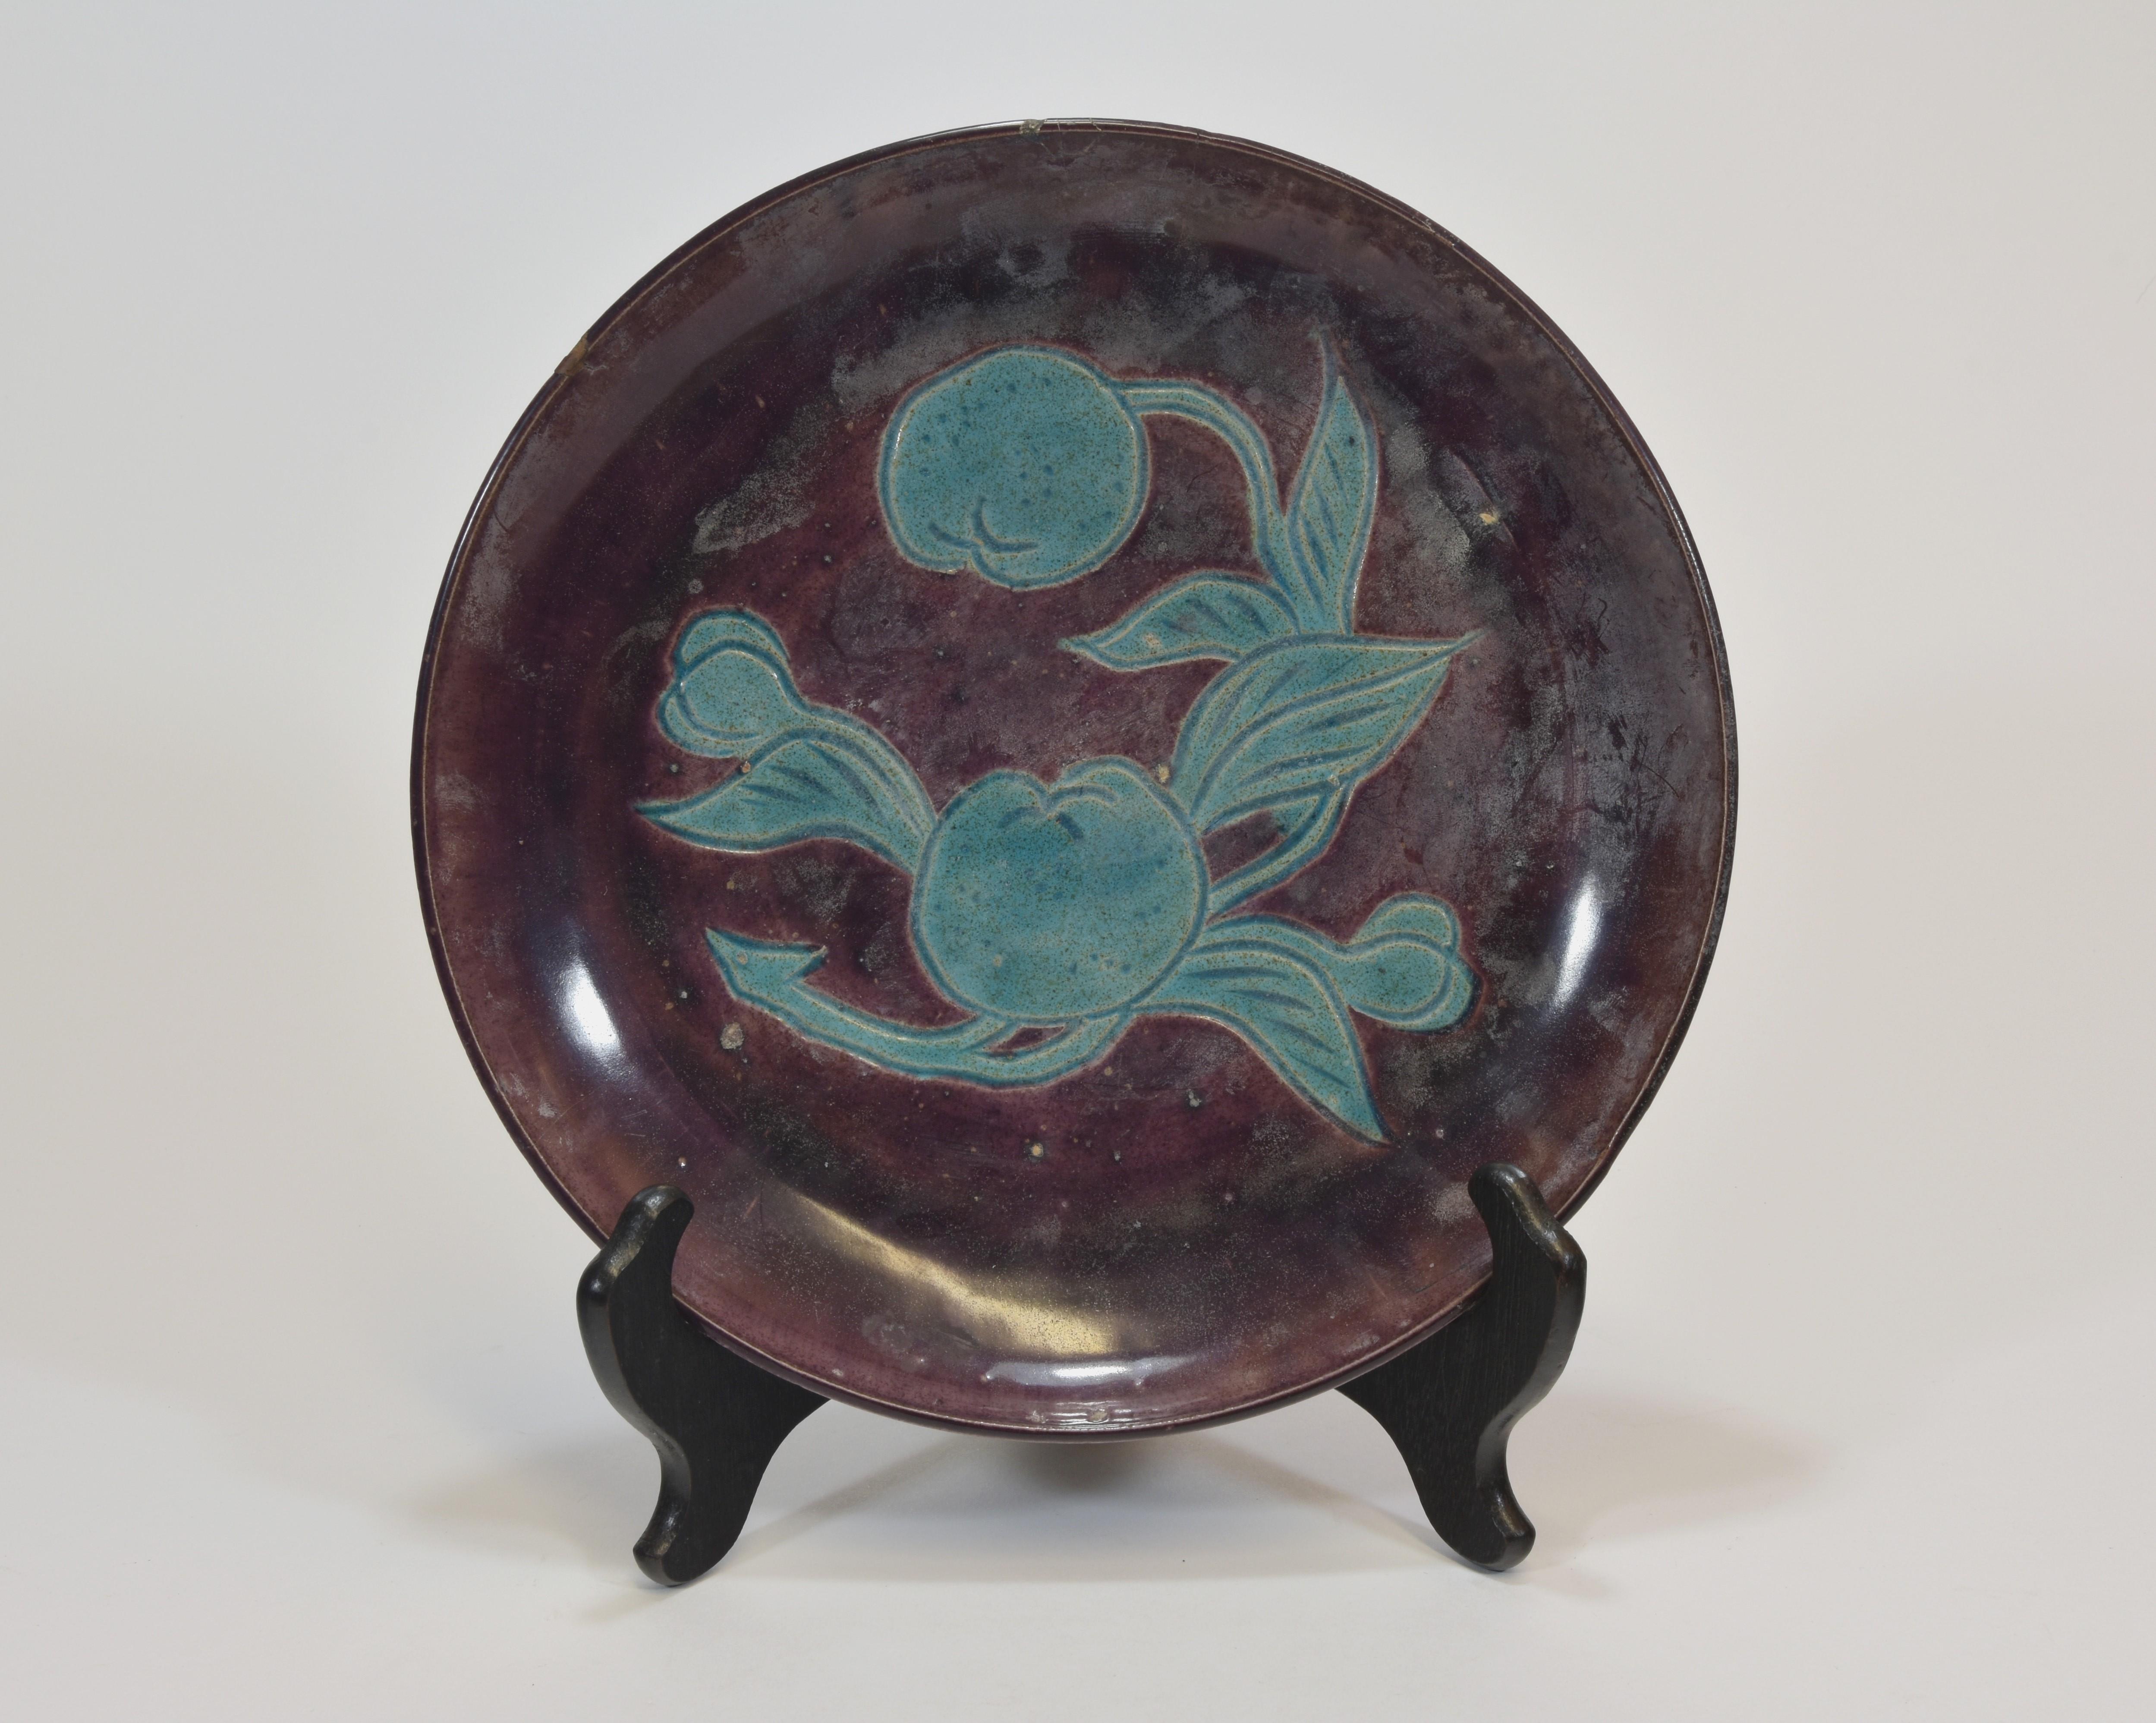 Lot 19 - An aubergine glazed dish with two peaches Kangxi period 25cm diameter清 康熙時期 茄子釉碟